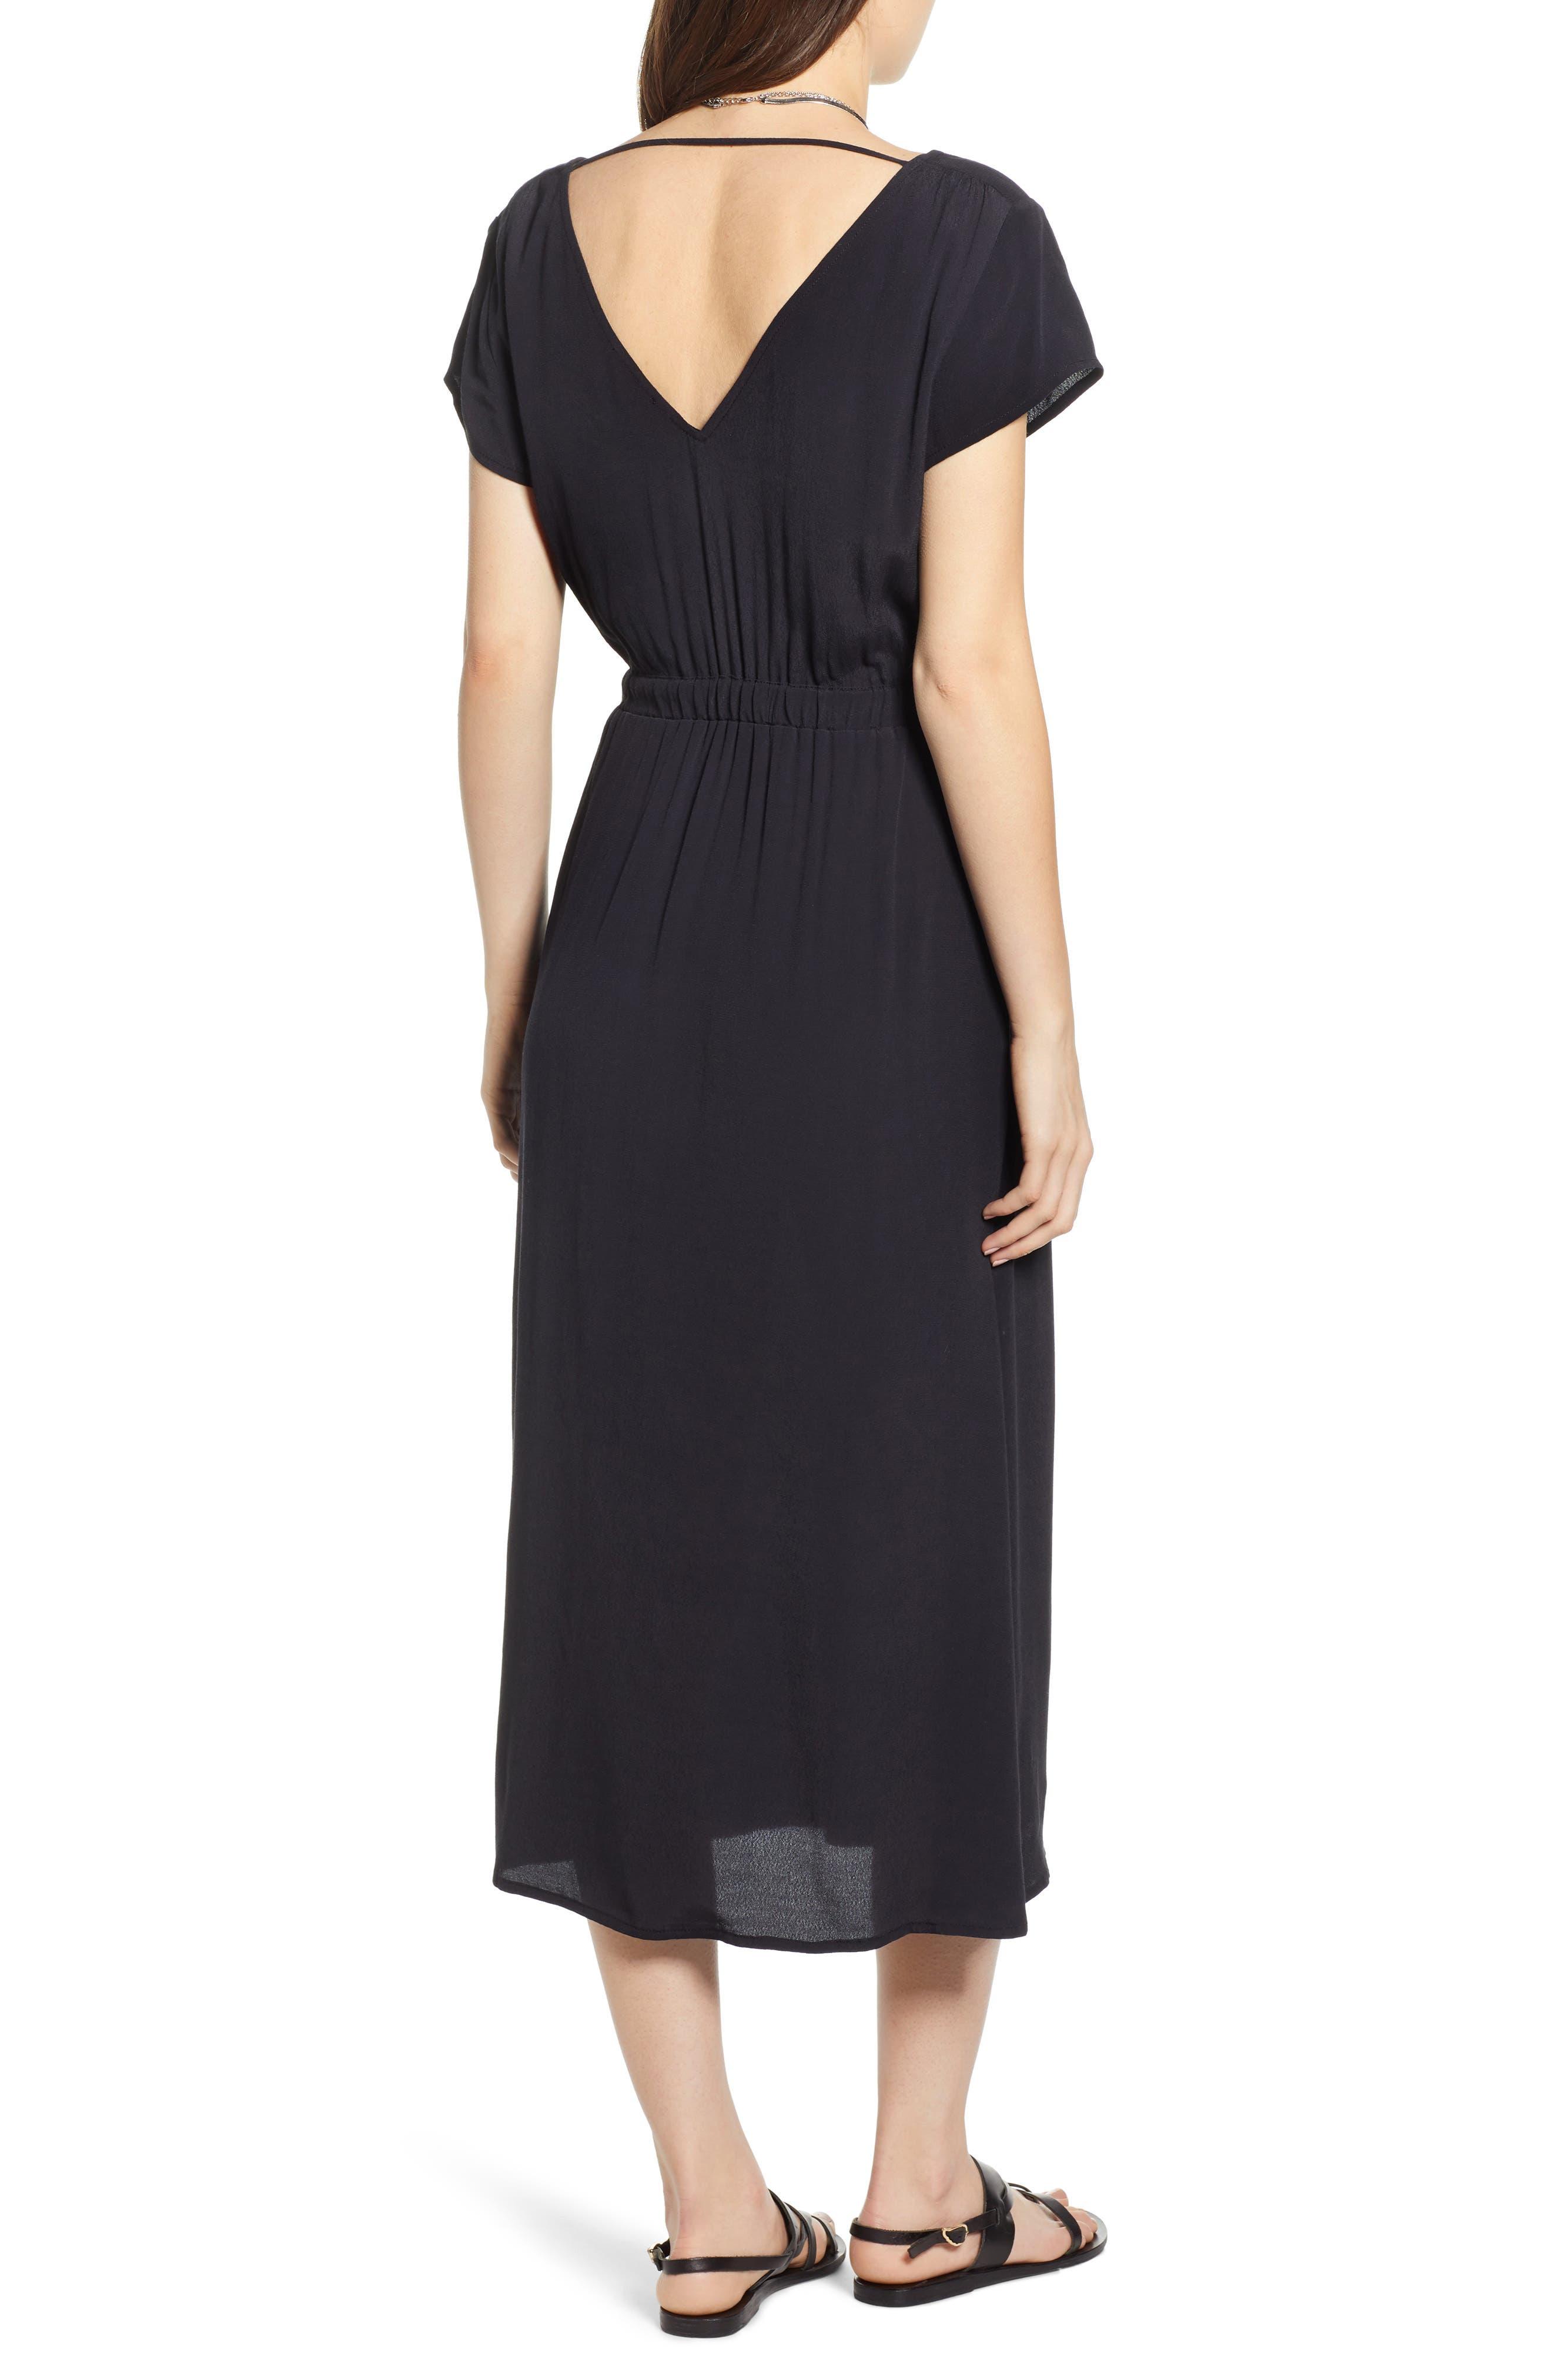 TREASURE & BOND, Cap Sleeve Midi Dress, Alternate thumbnail 2, color, BLACK